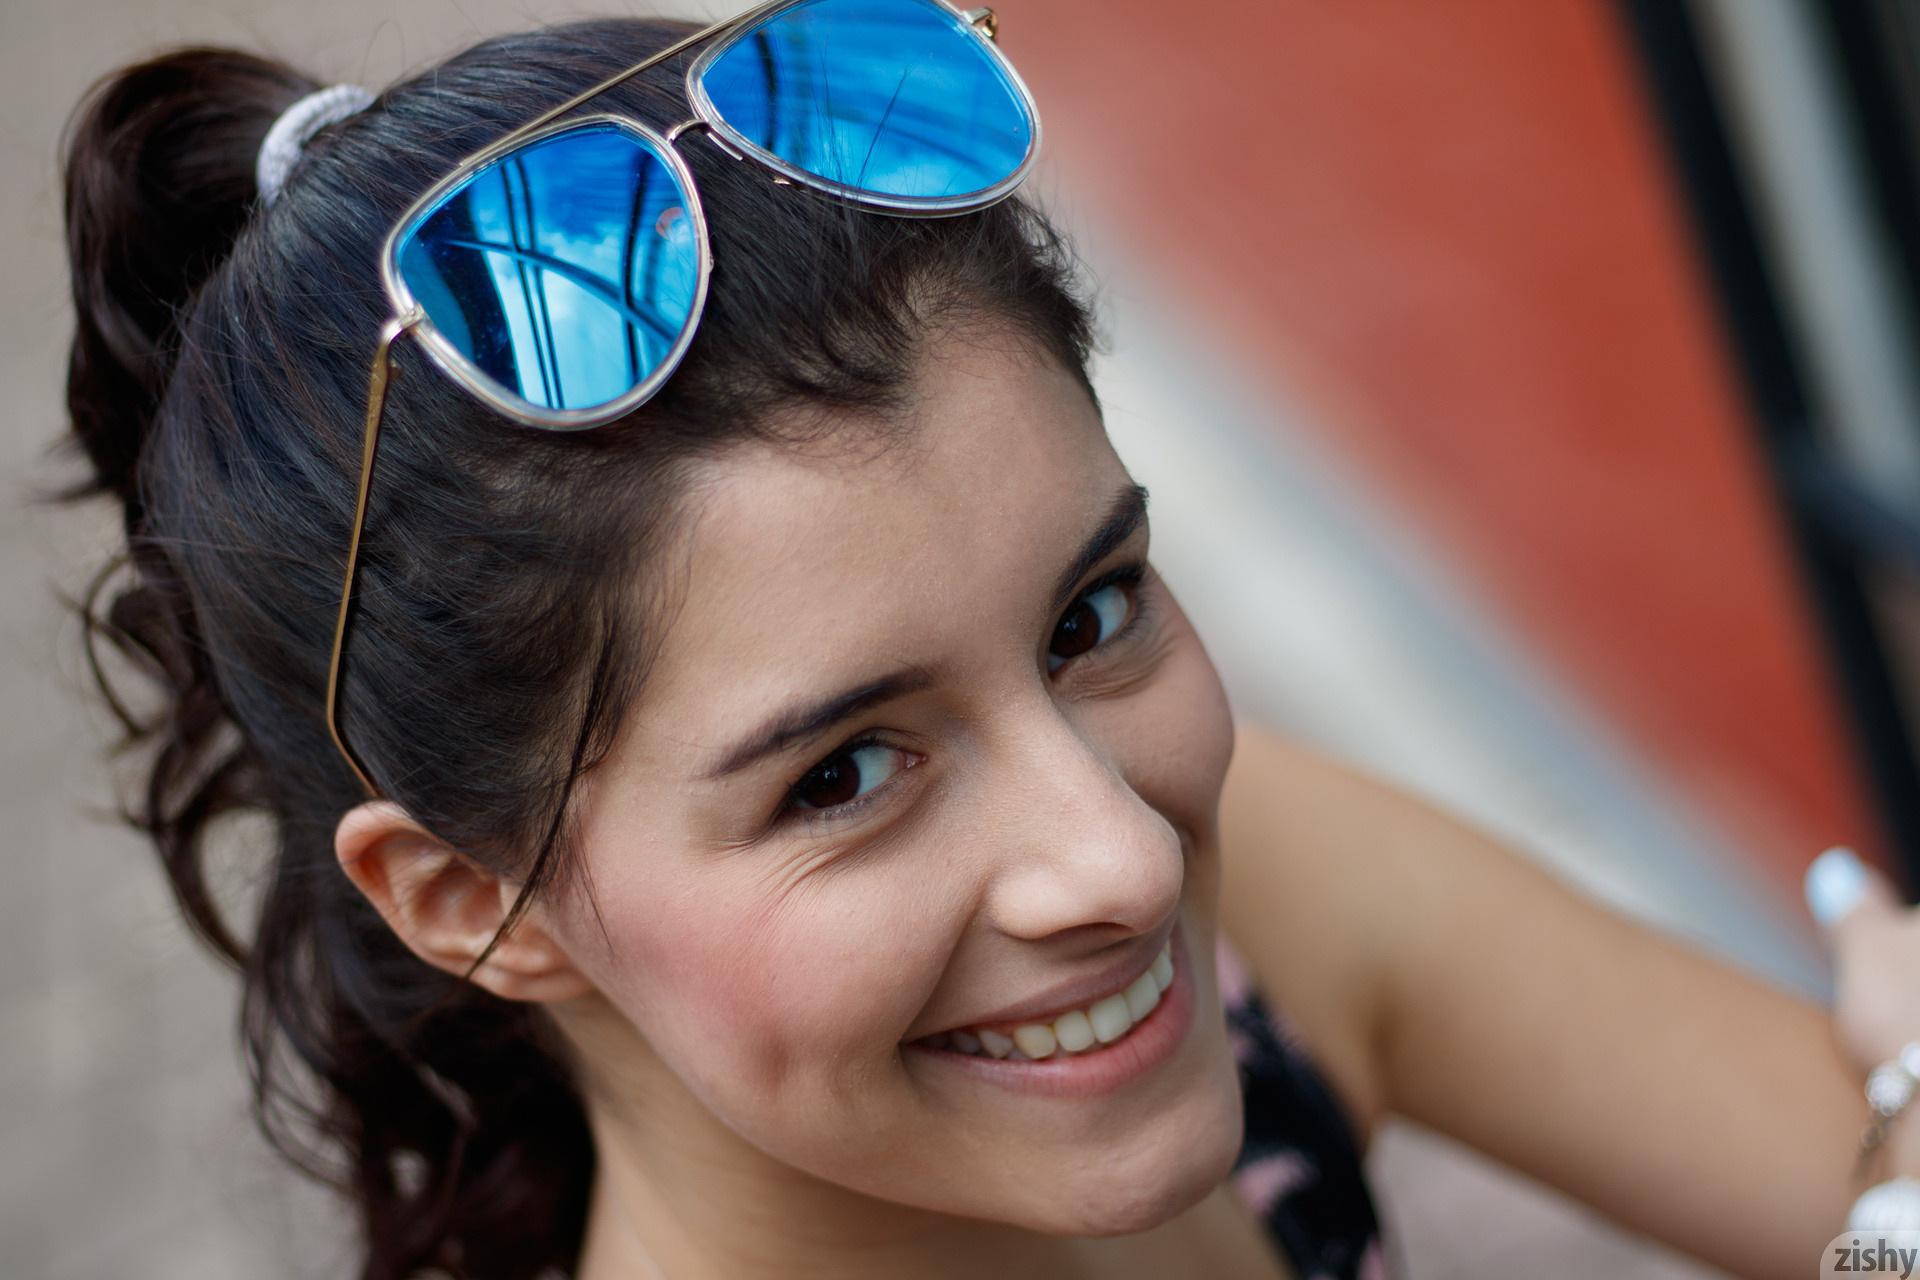 Kate Maze Skates Colombia Zishy (17)